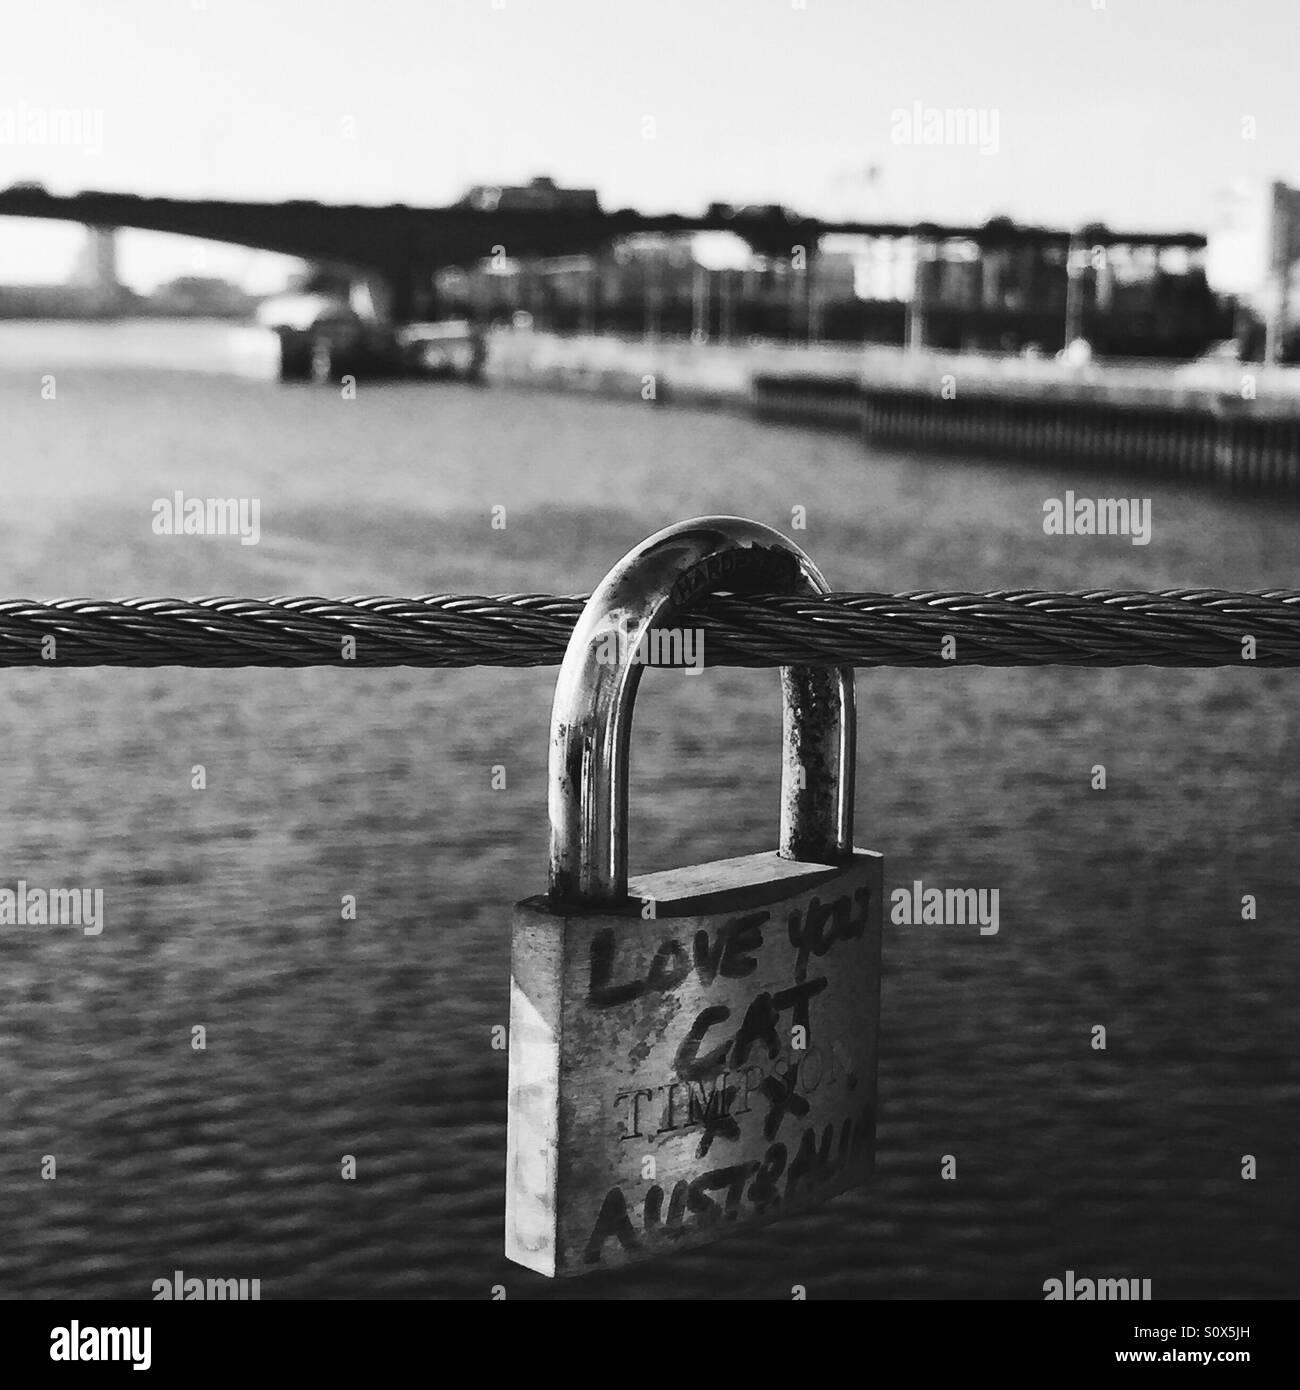 A lovelock on the Tradeston Bridge AKA the Squiggly Bridge in Glasgow, Scotland, UK Stock Photo